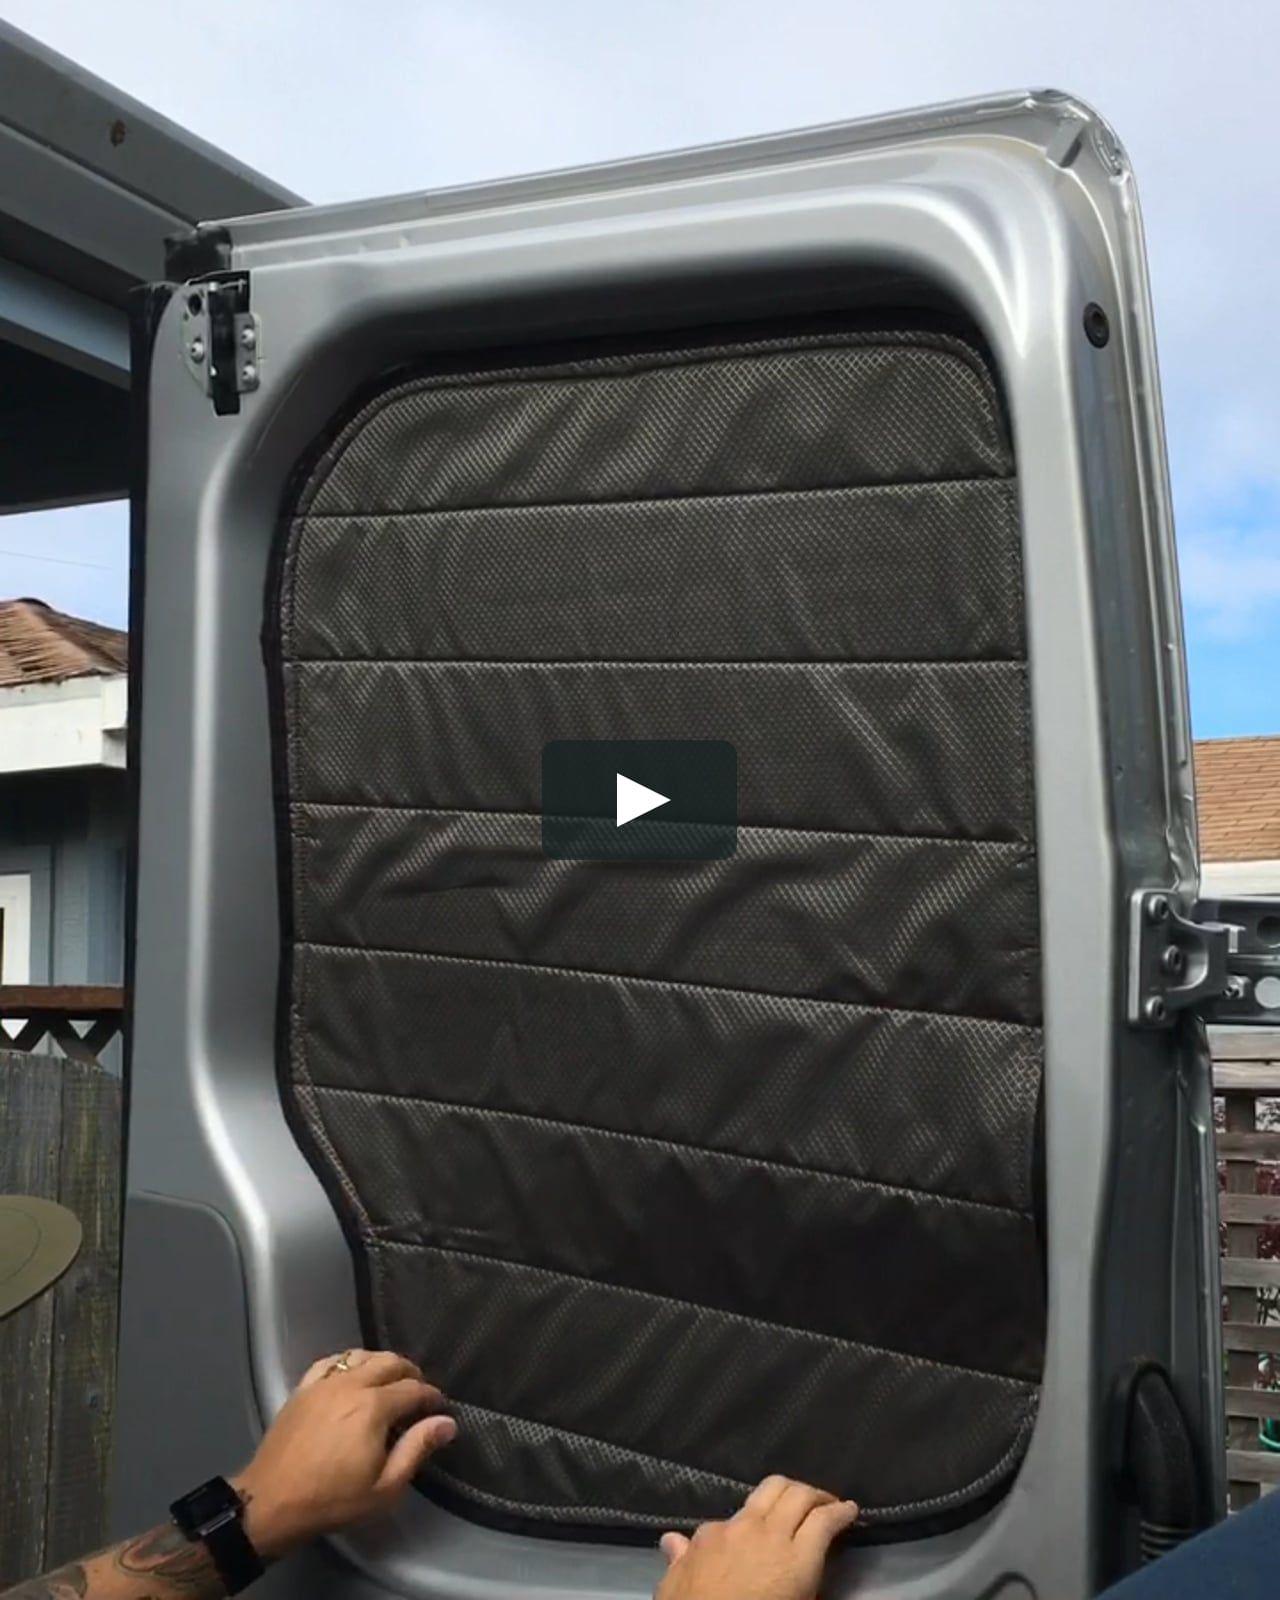 Sprinter van insulated window covers in 2020 Sprinter